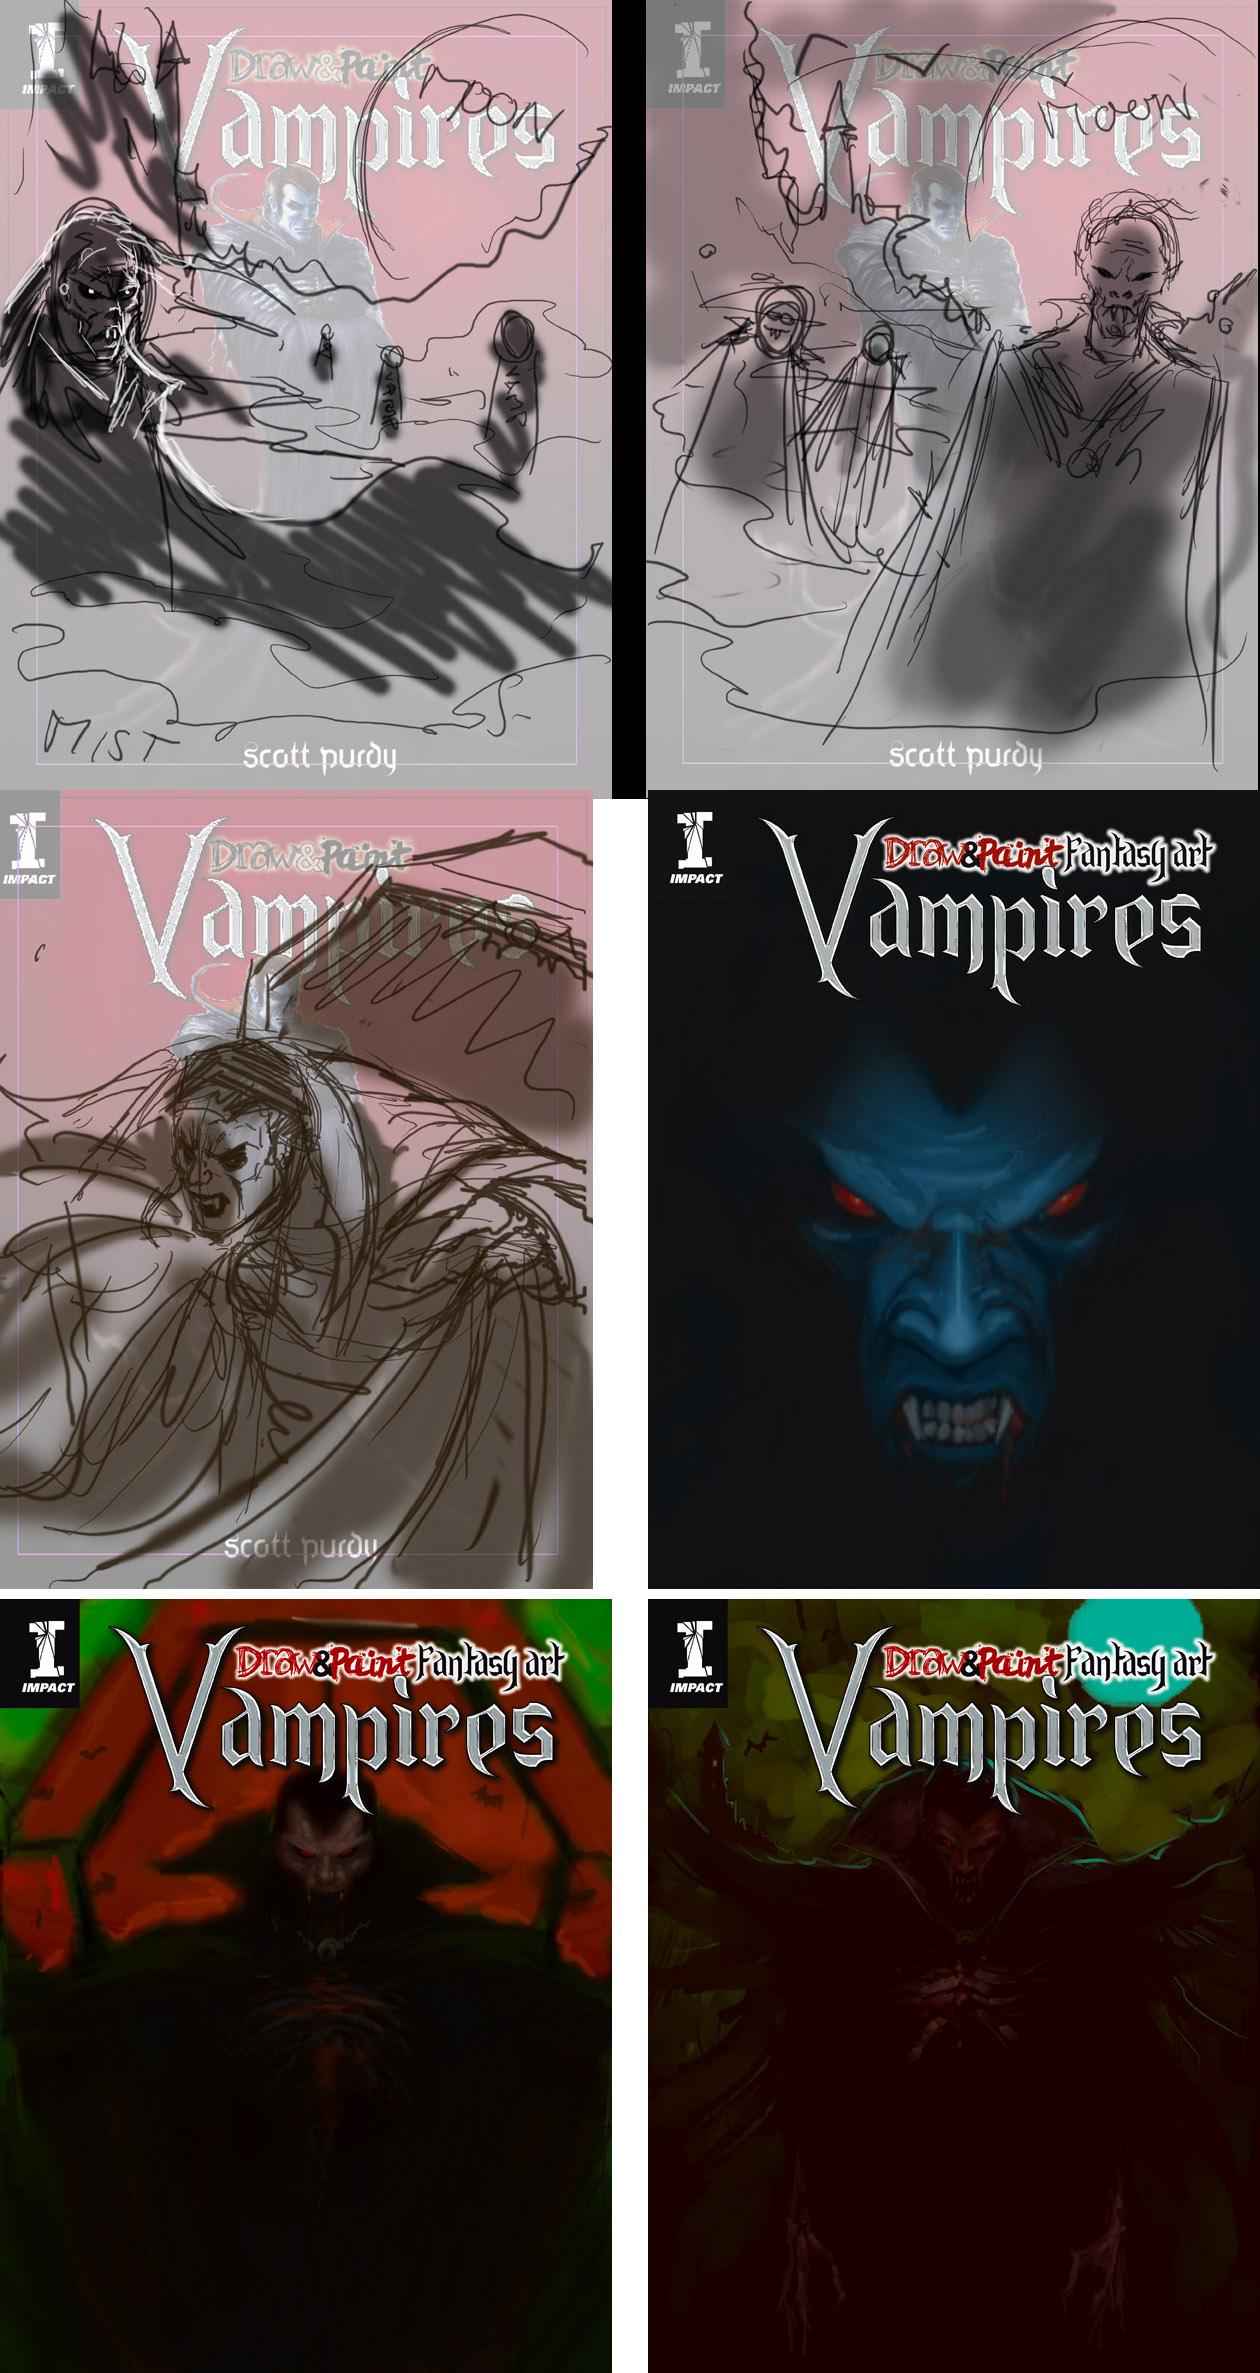 Vampire Book Cover Art : Vampire book cover ideas by scottpurdy on deviantart